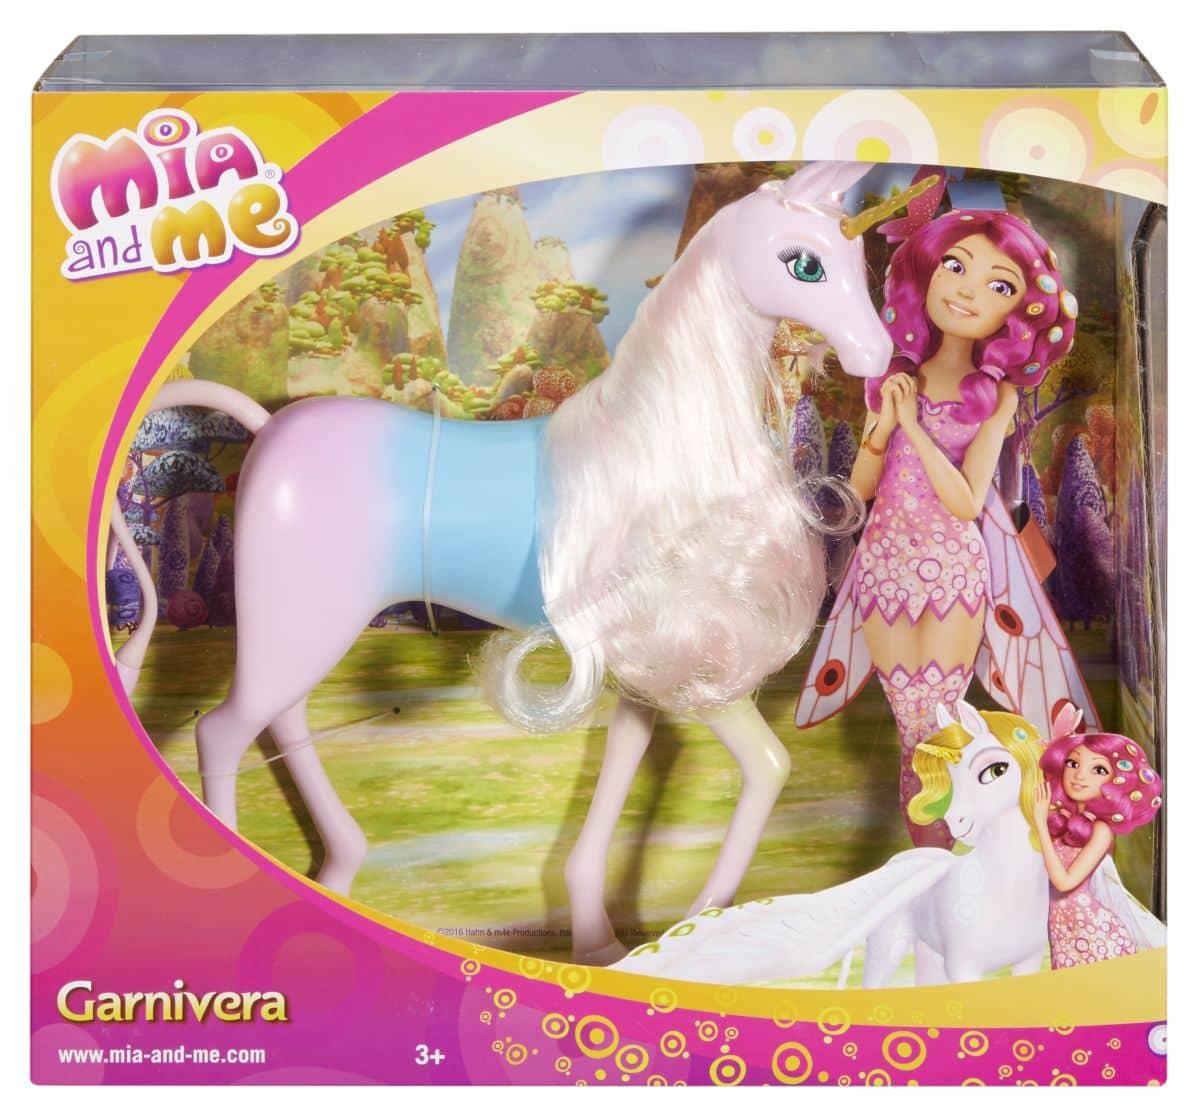 Mia and me einh rner online kaufen - Barbie et la licorne ...